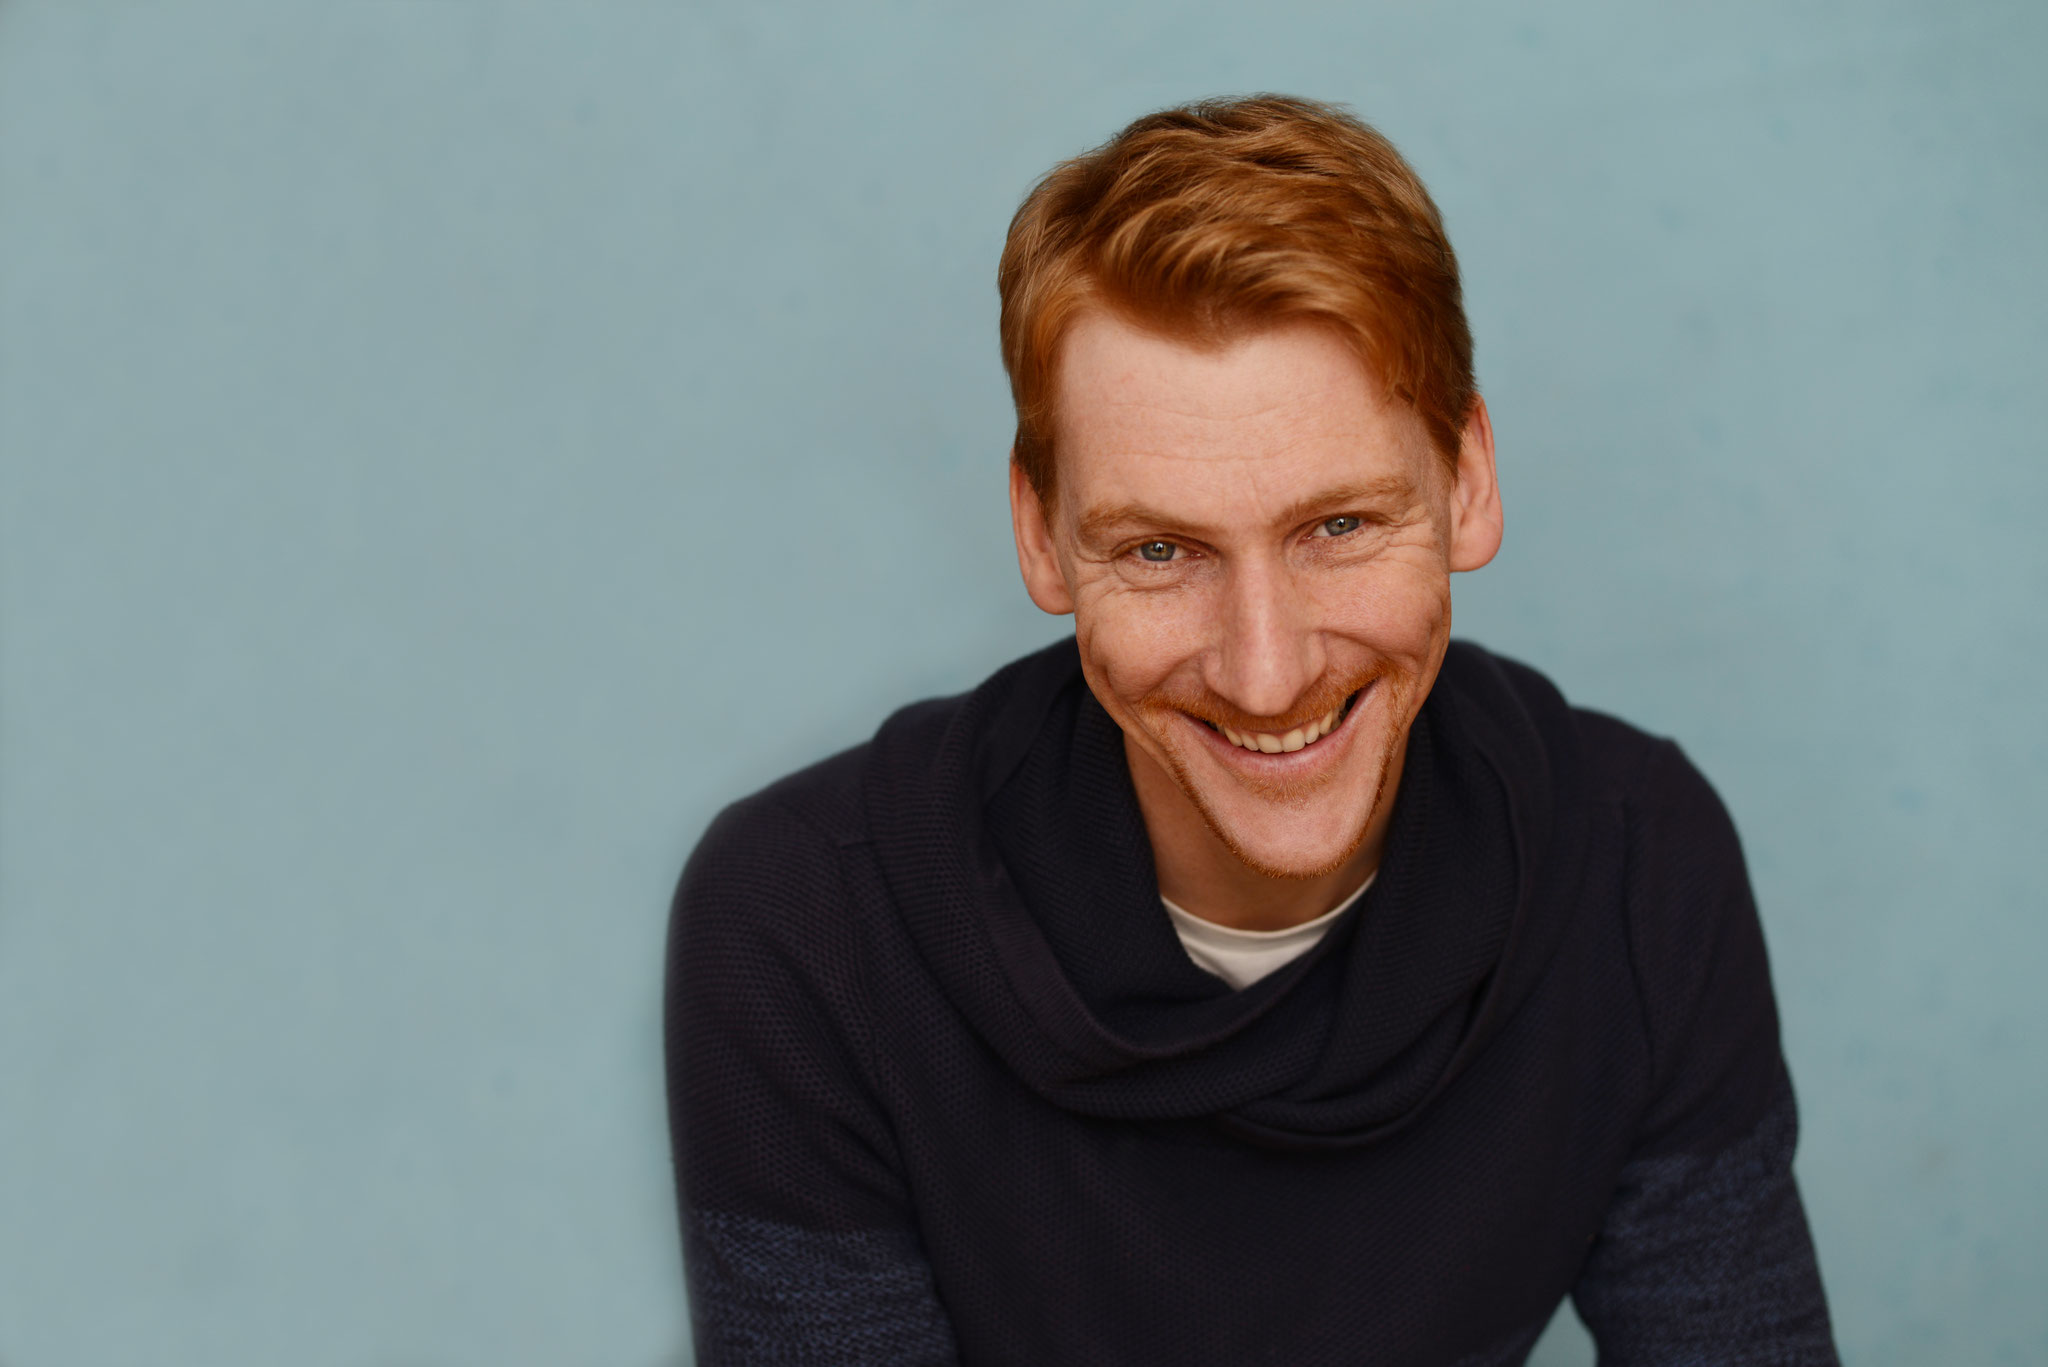 Phillipp Nägele, Schauspieler